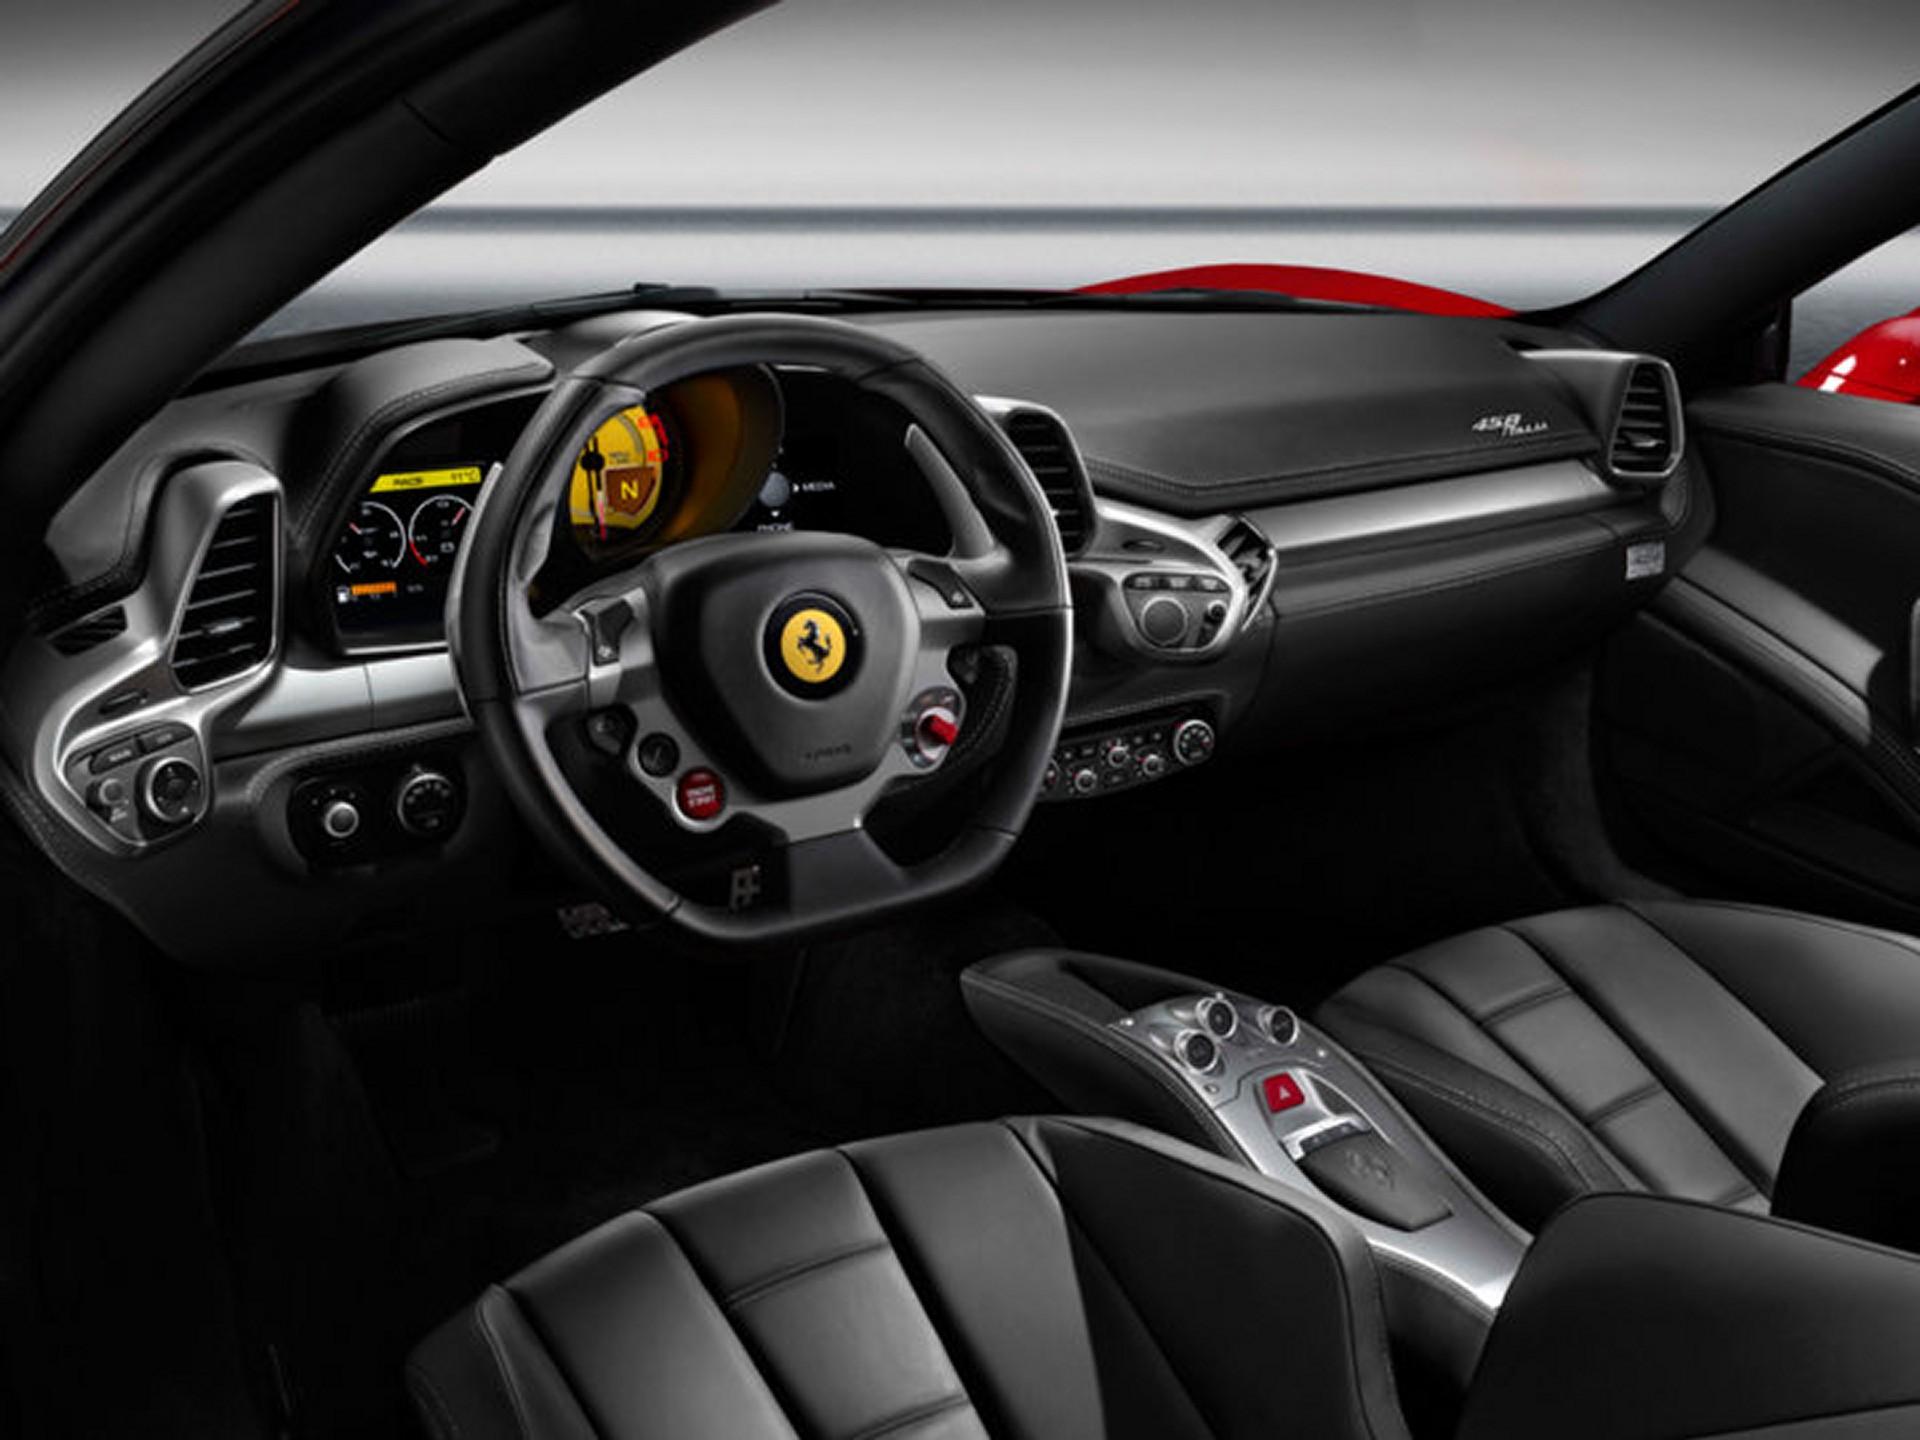 Ferrari 458 Italia - Inside - W exotic car rentals